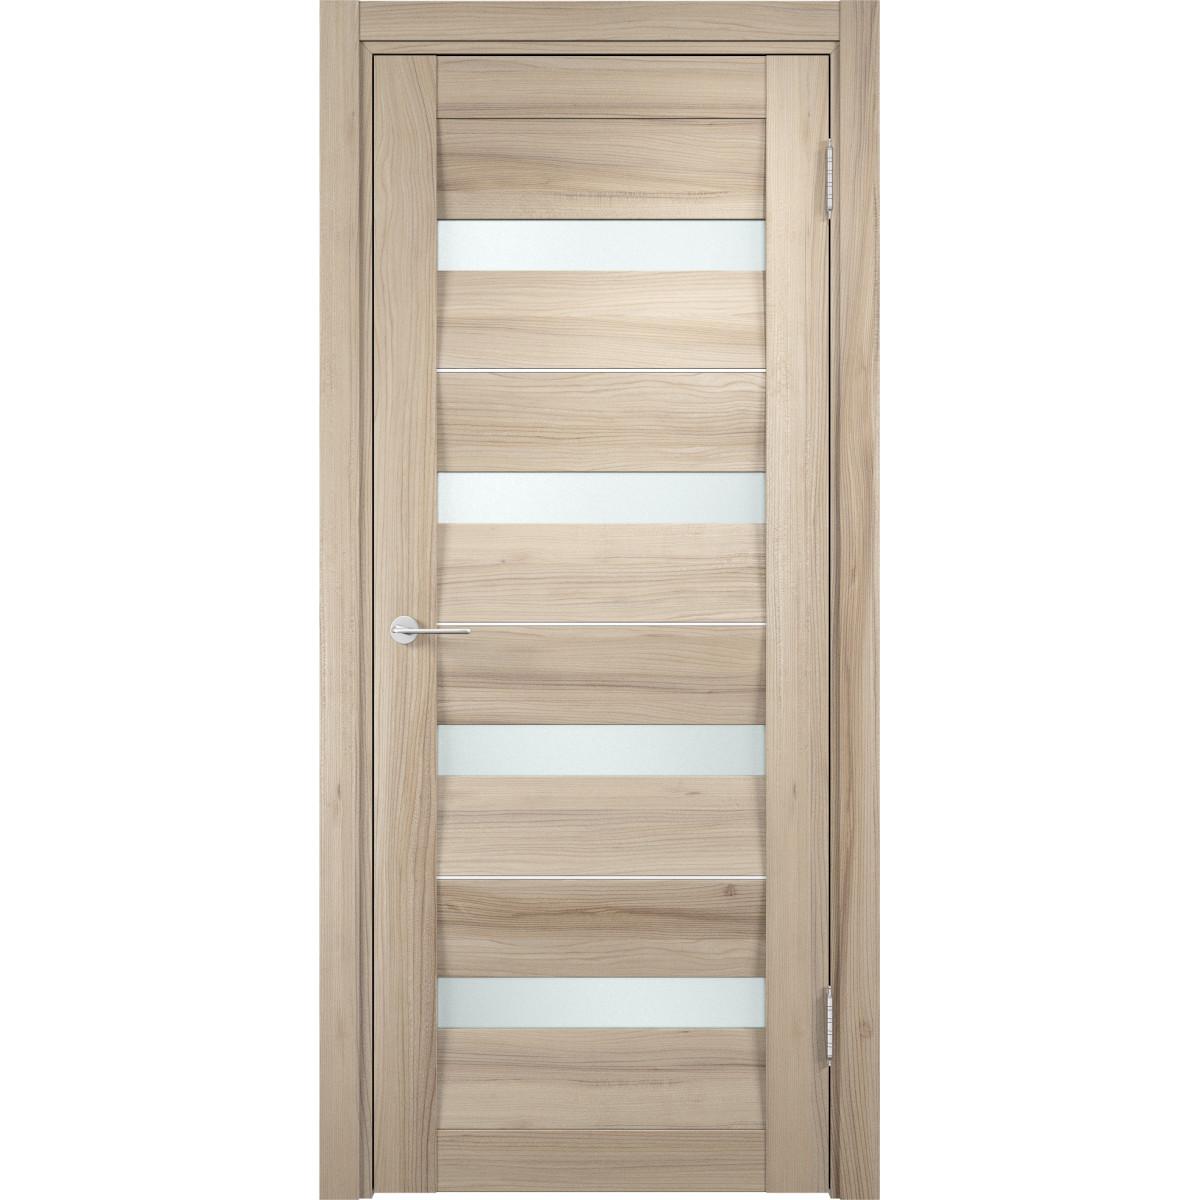 Дверное полотно Casaporte Сицилия МП_0151 2000х800х44 мм МДФ